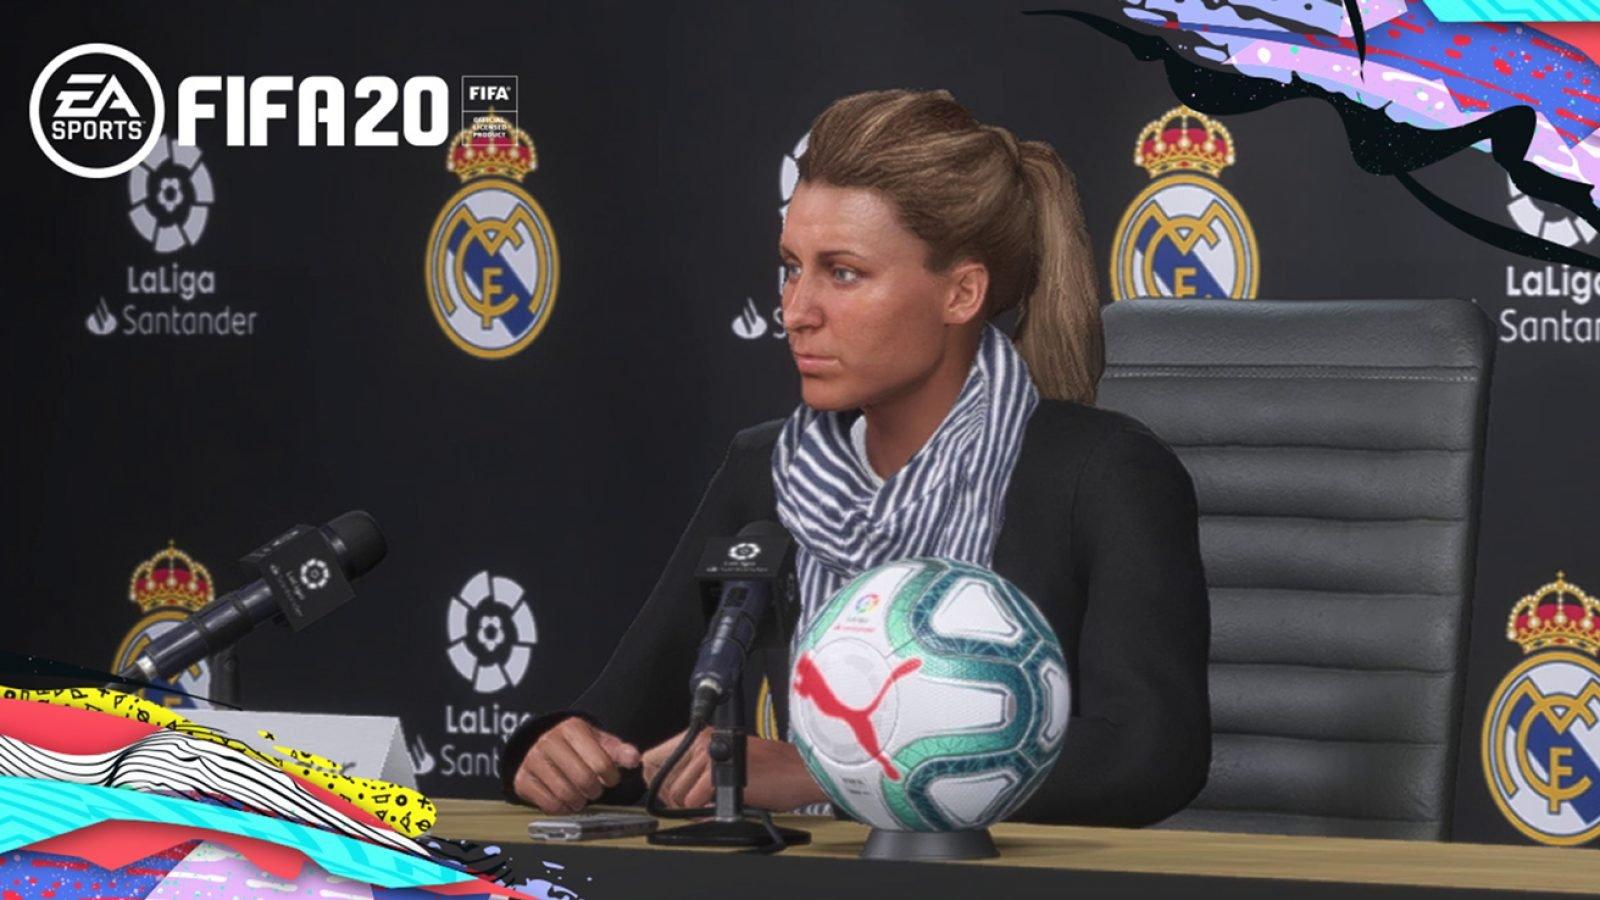 FIFA 20 Carrière